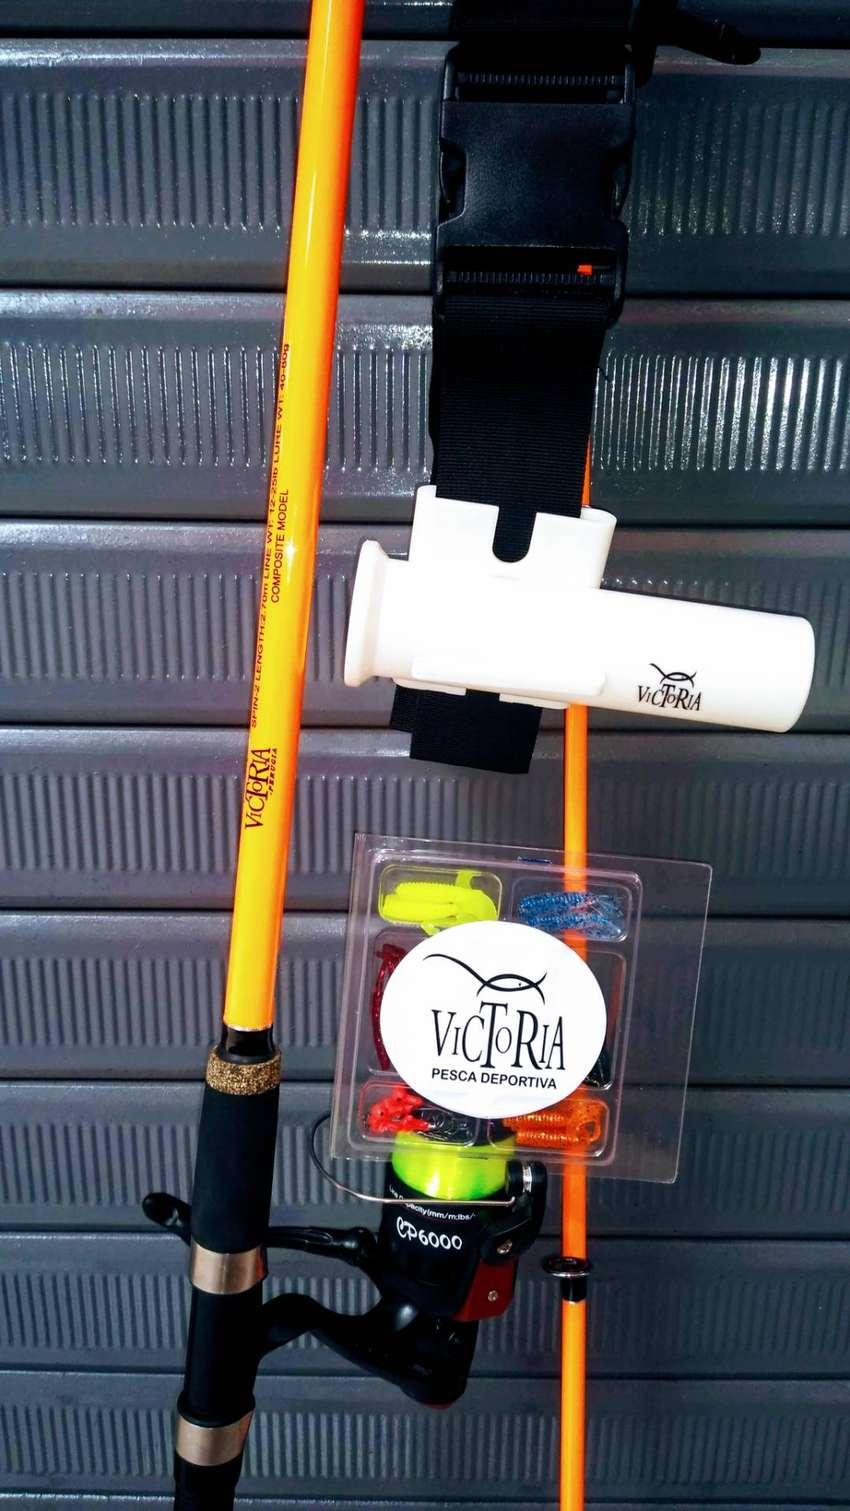 Caña de pescar Victoria 2.70m kit completo OFERTA!! 0